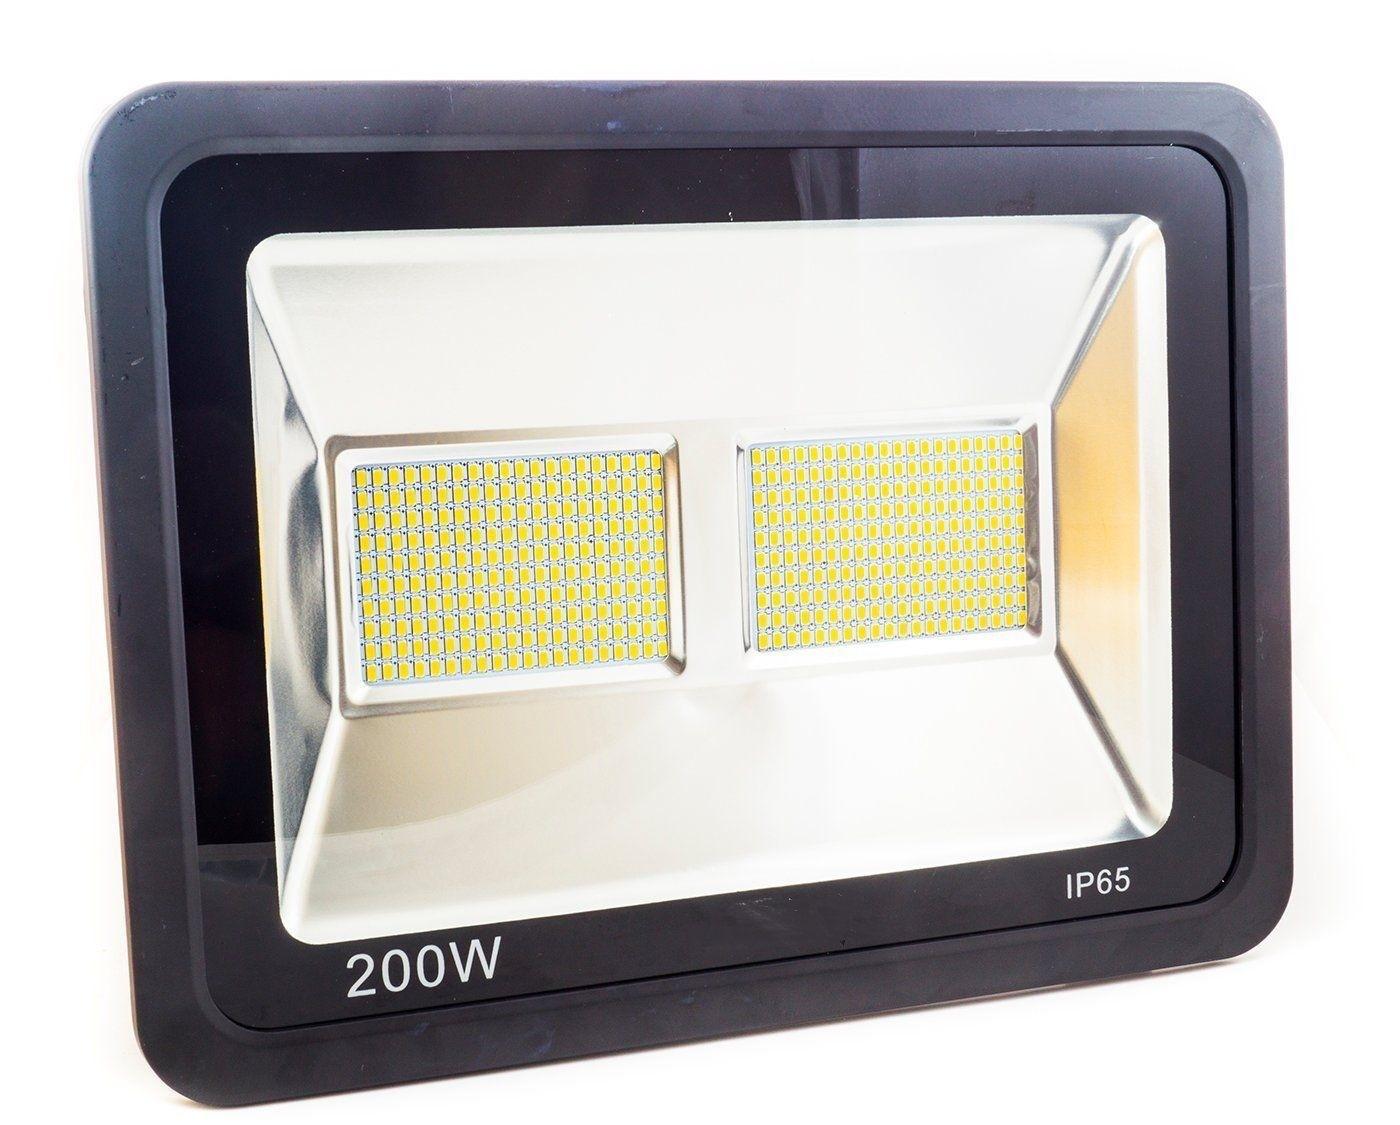 HEADLIGHT LED SPOTLIGHT SMD DOUBLE PLATE LIGHT LAMP 200 W WATT IP65 220V 1800LMN